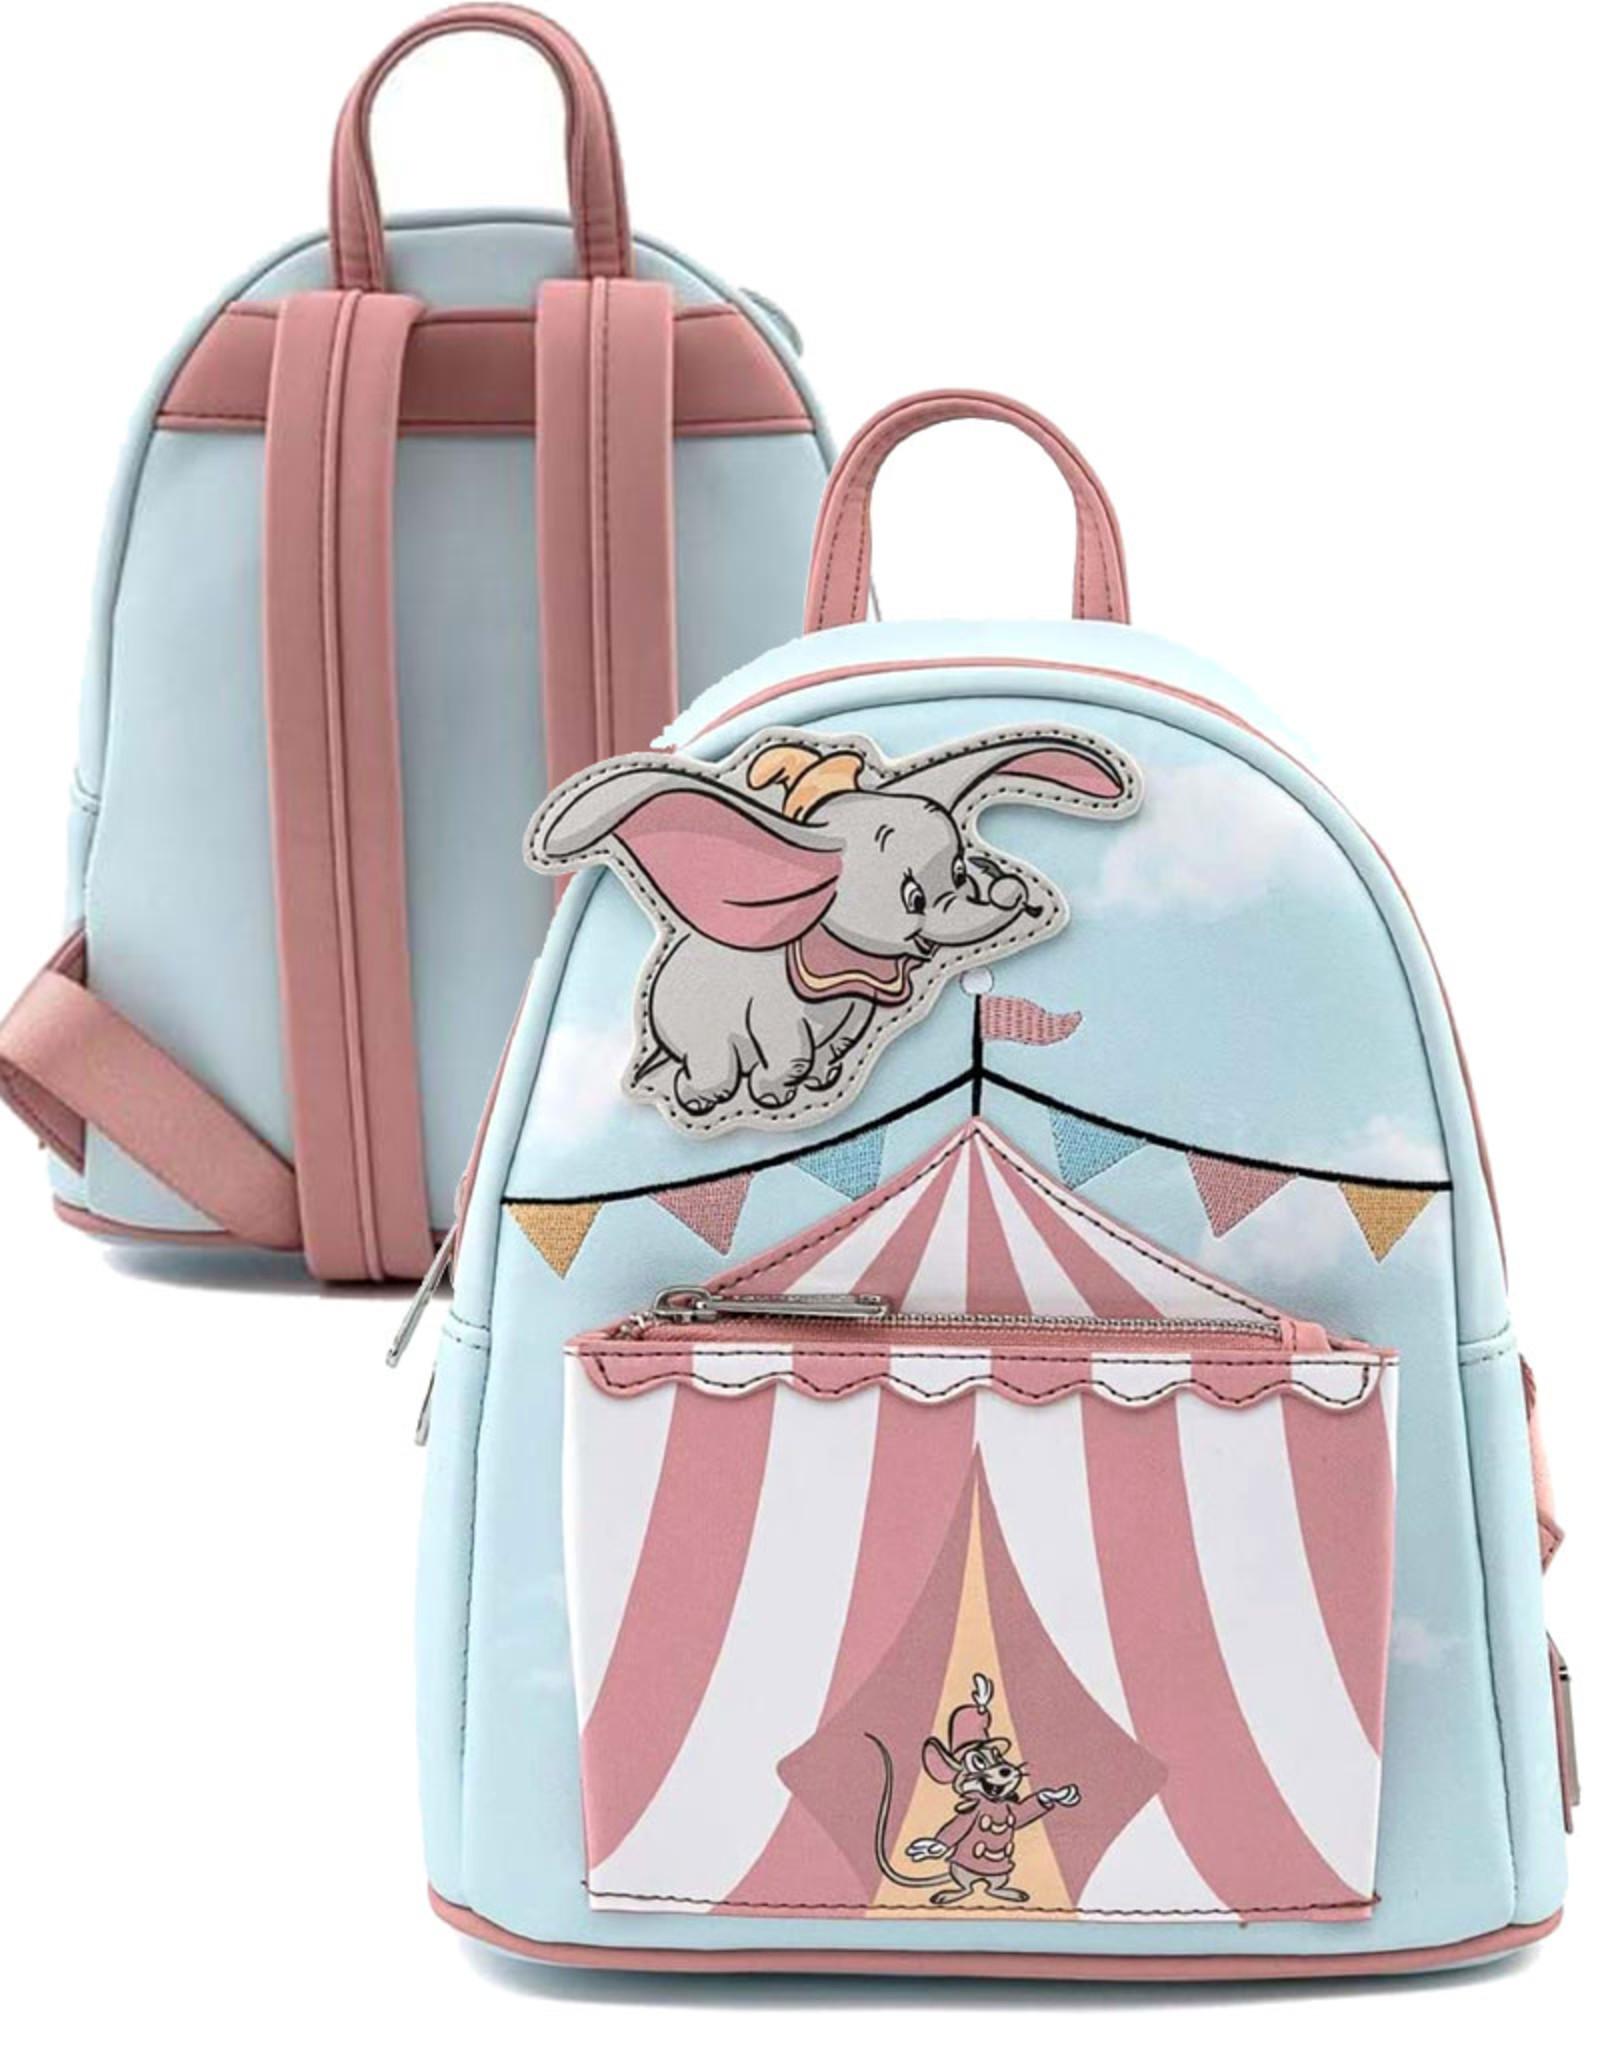 Disney ( Loungefly Mini Backpack )  Flying Dumbo